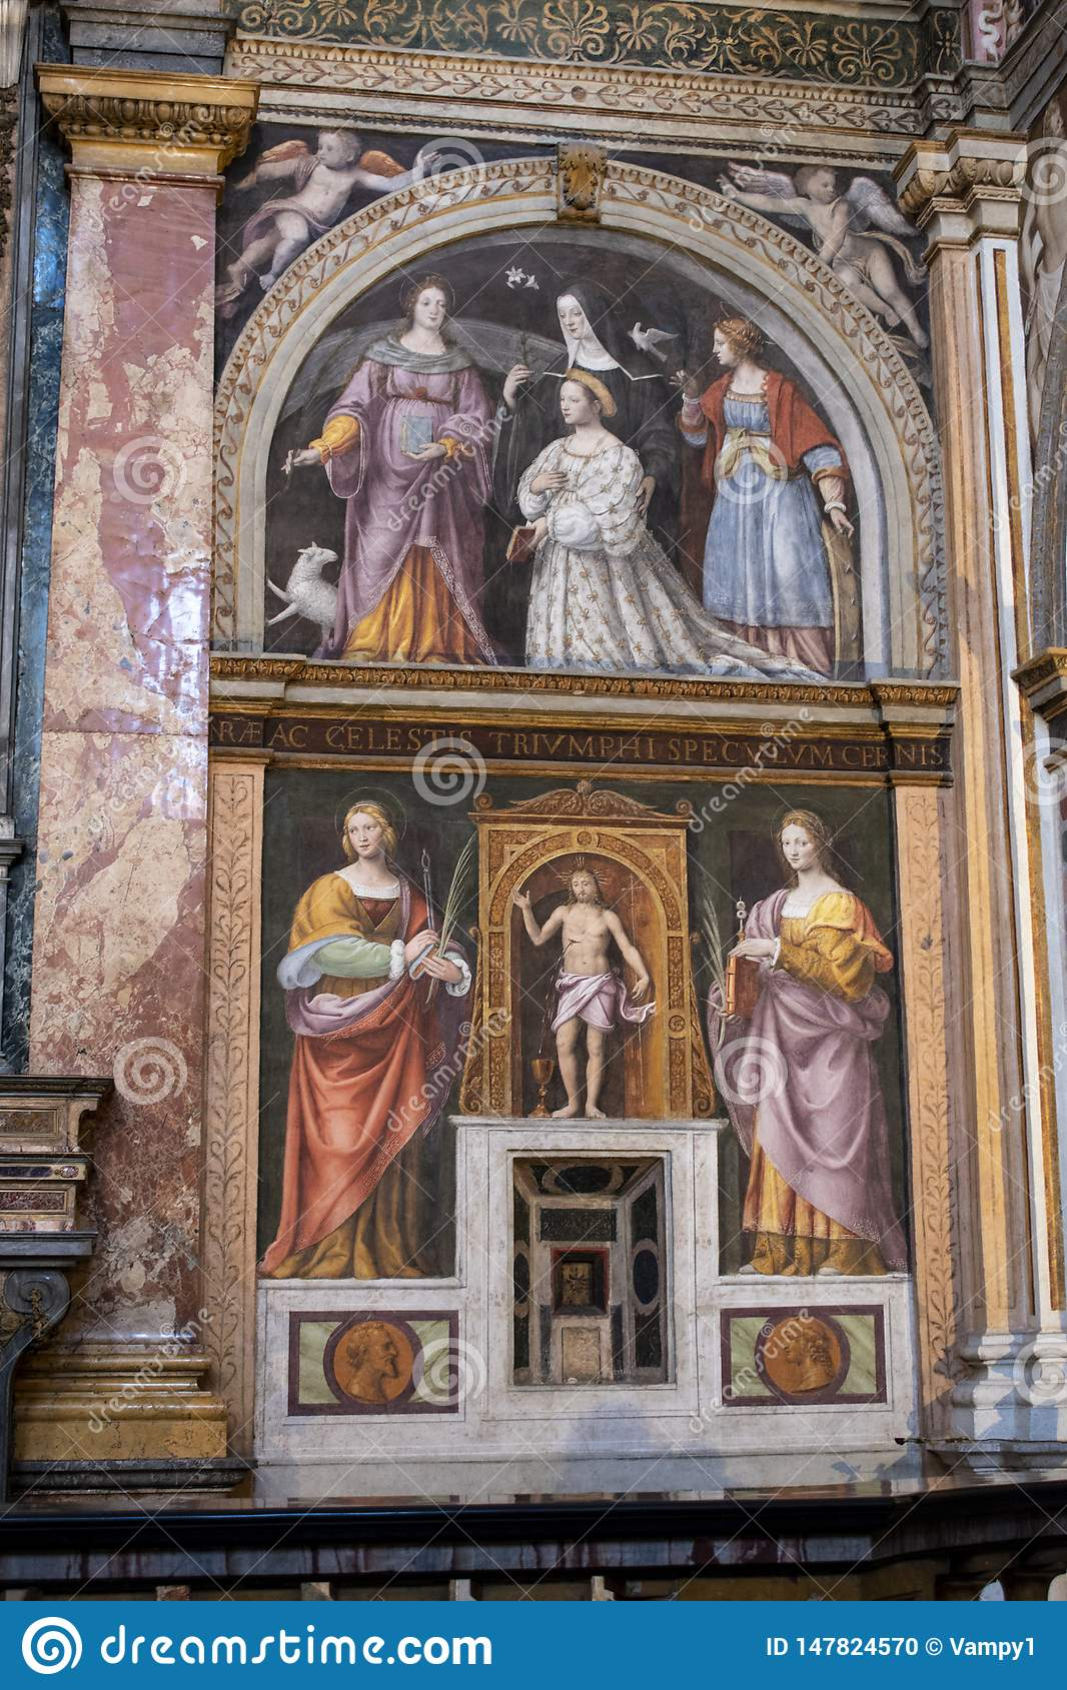 Милан, Италия, Европа, al Monastero Maggiore Сан Maurizio, церковь, Сикстинская капелла Милана, искусства, фрески, монастыря, мон